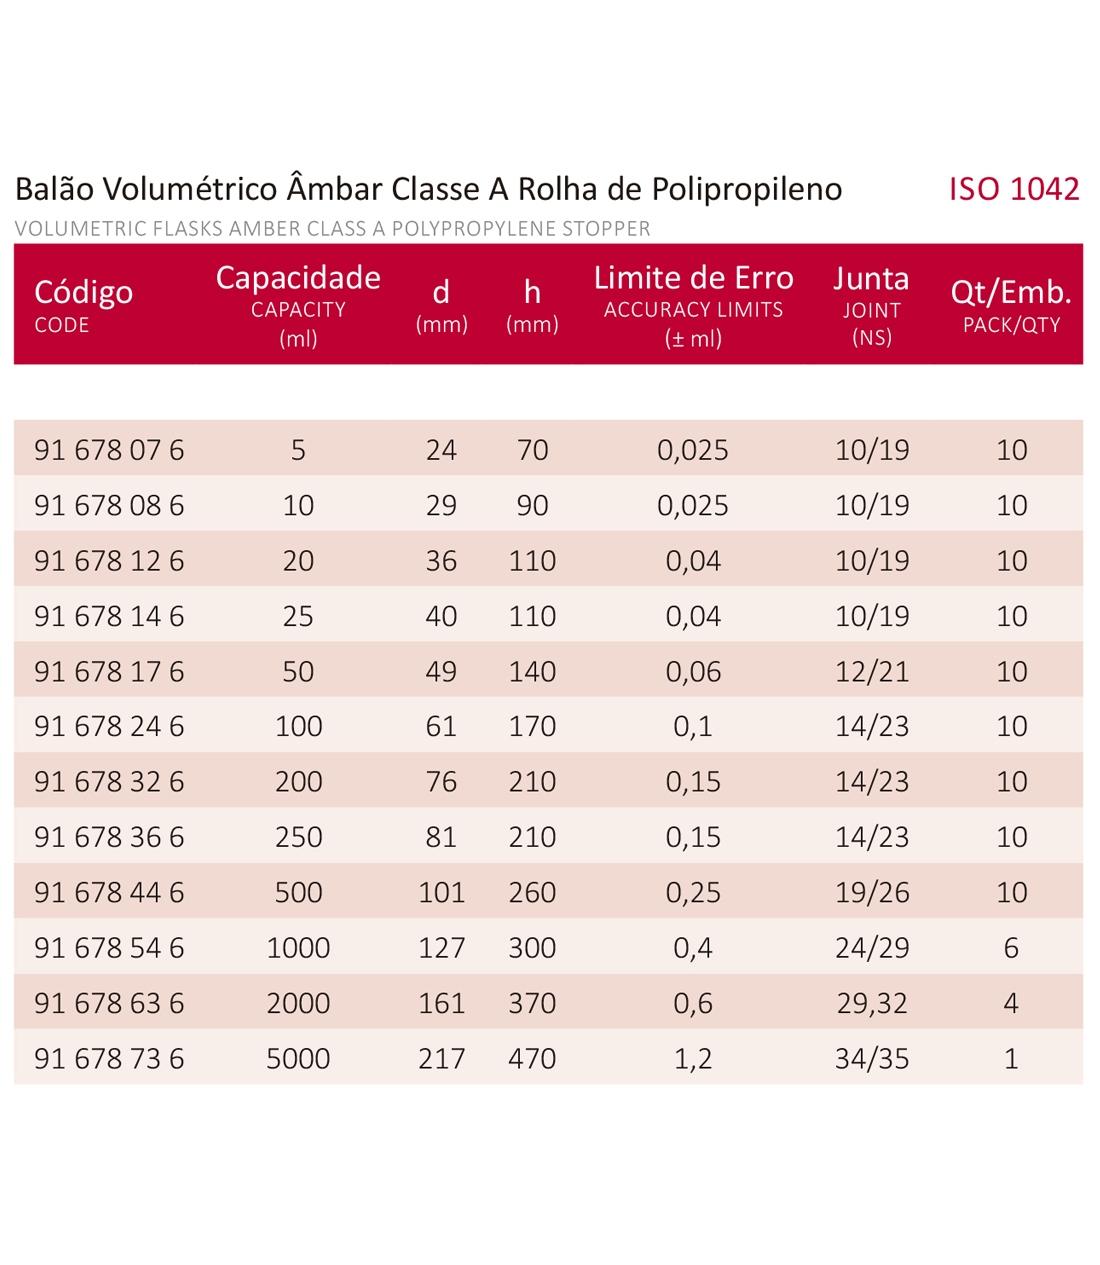 BALÃO VOLUMÉTRICO CLASSE A ROLHA POLI ÂMBAR C/ CERTIFICADO RBC 25 ML - Marca Laborglas - Cód. 91678146-R